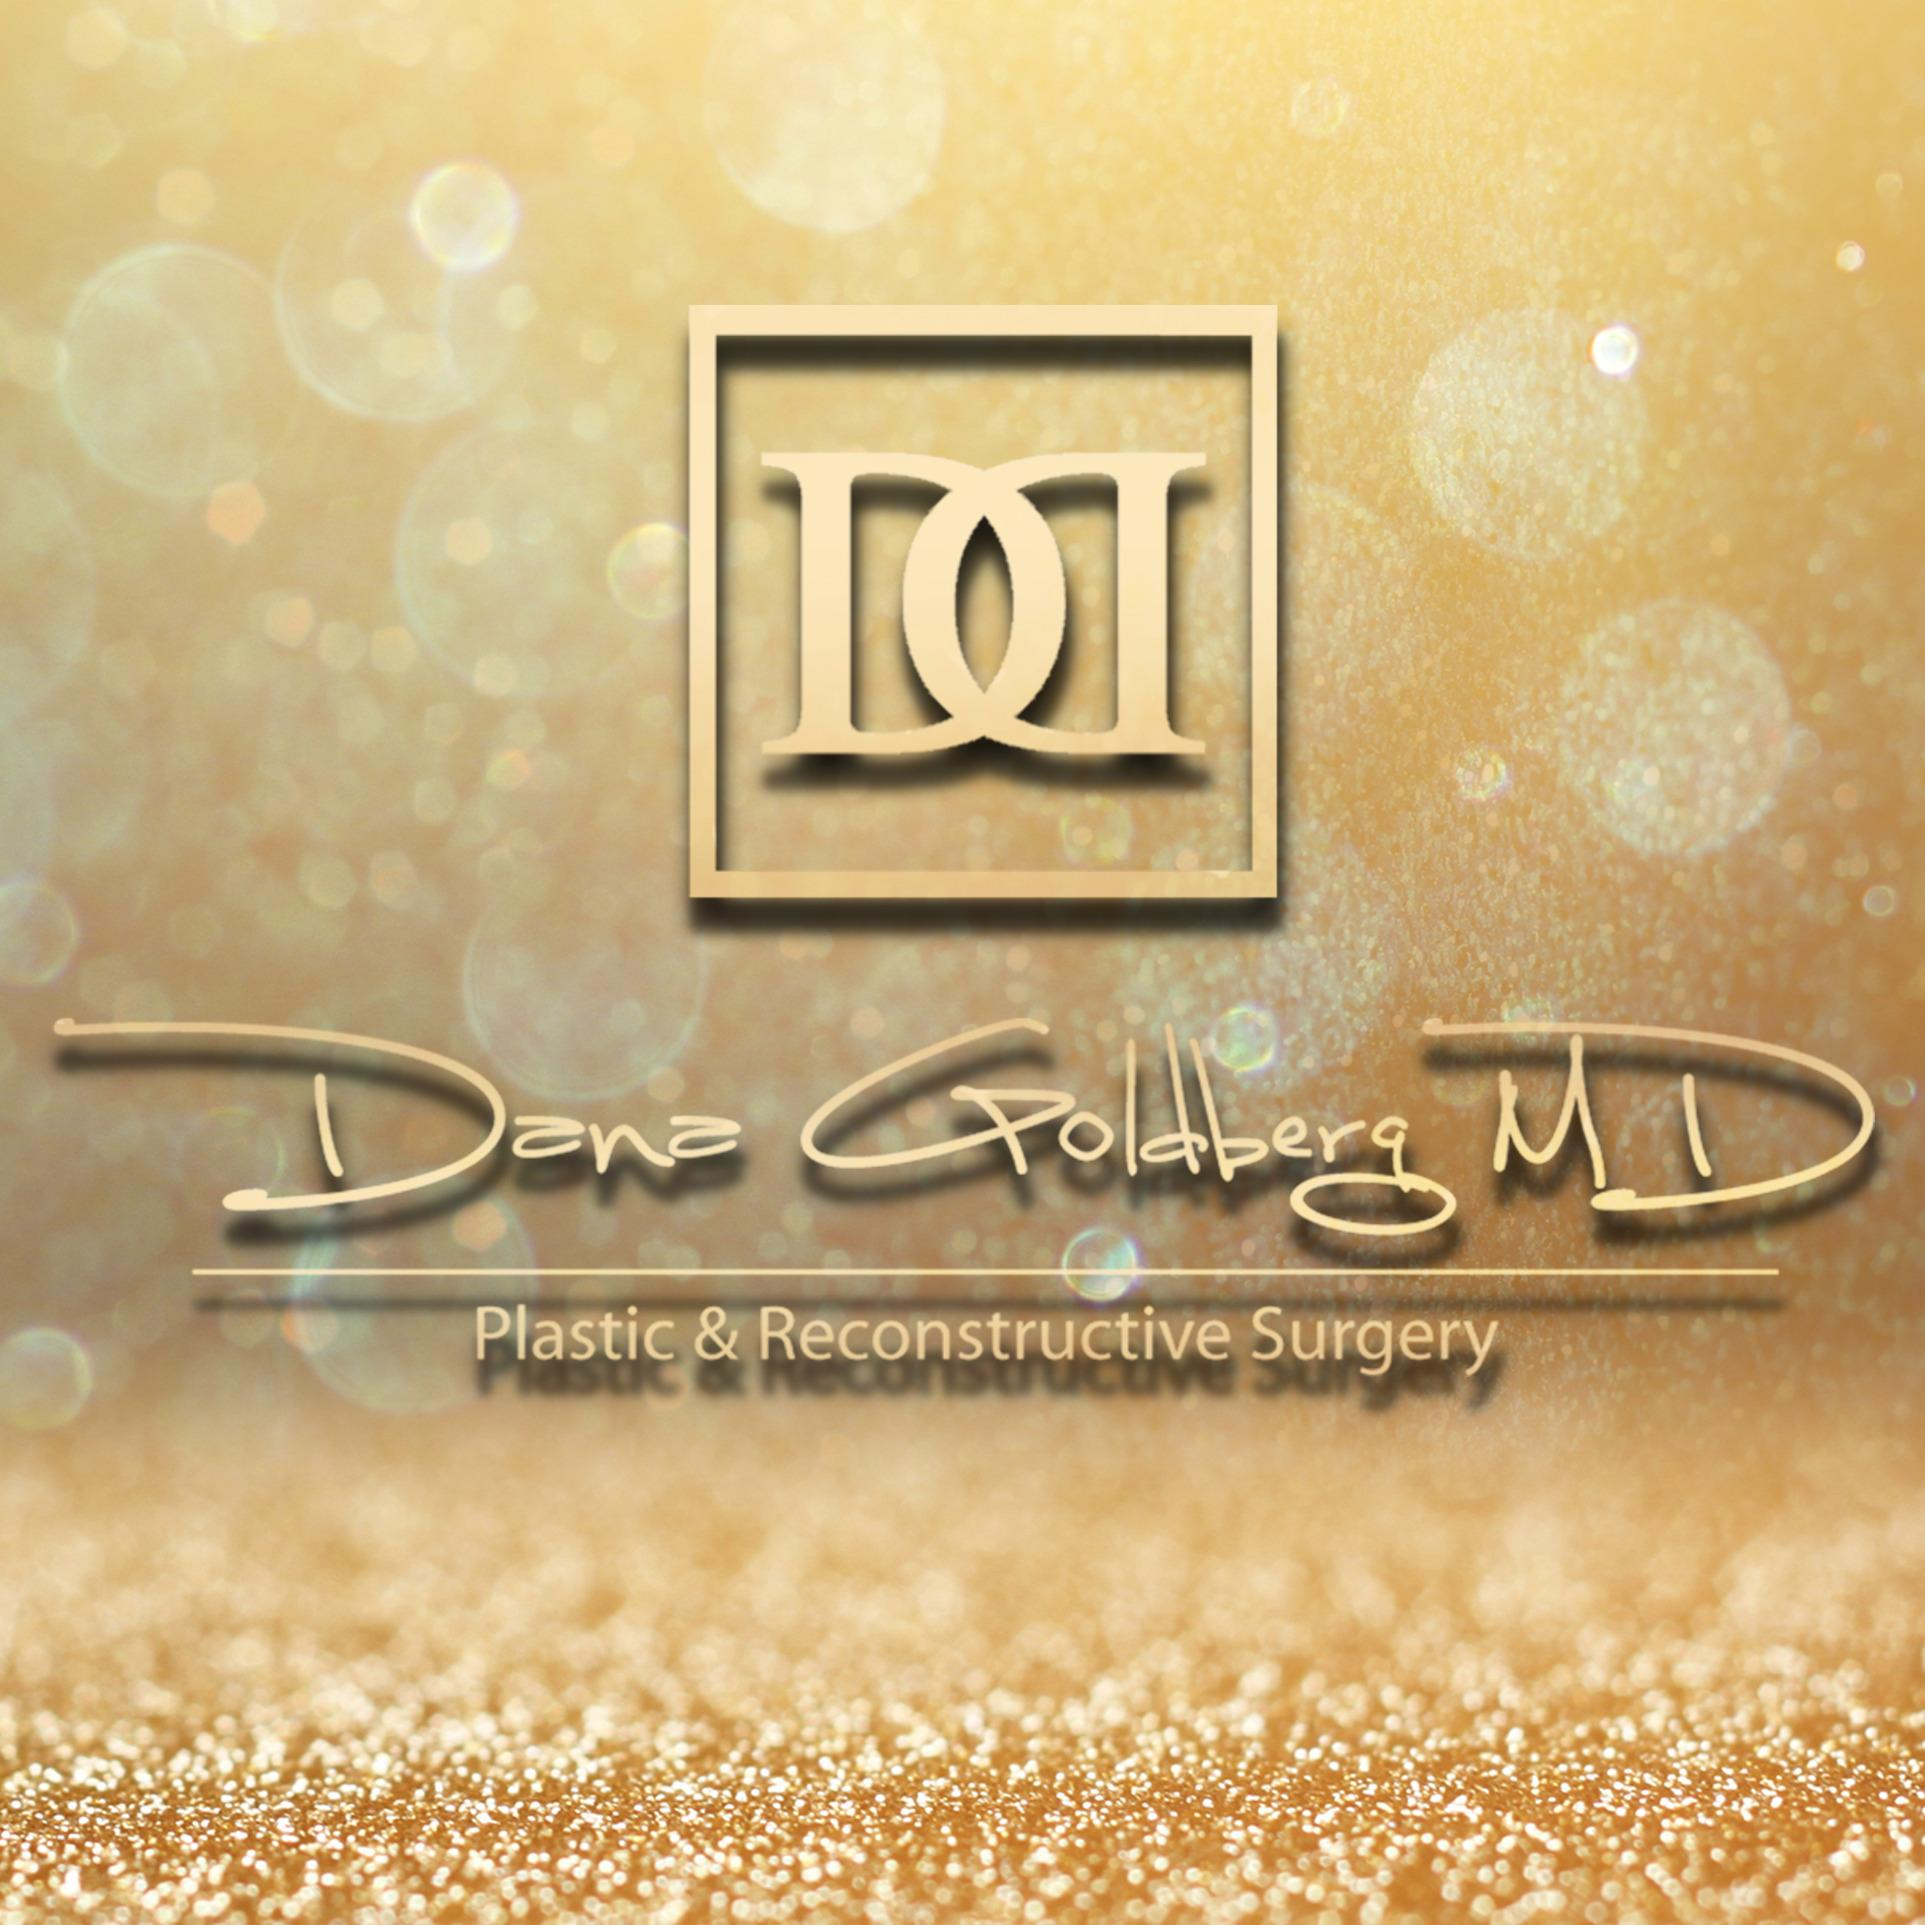 Dana M Goldberg MD